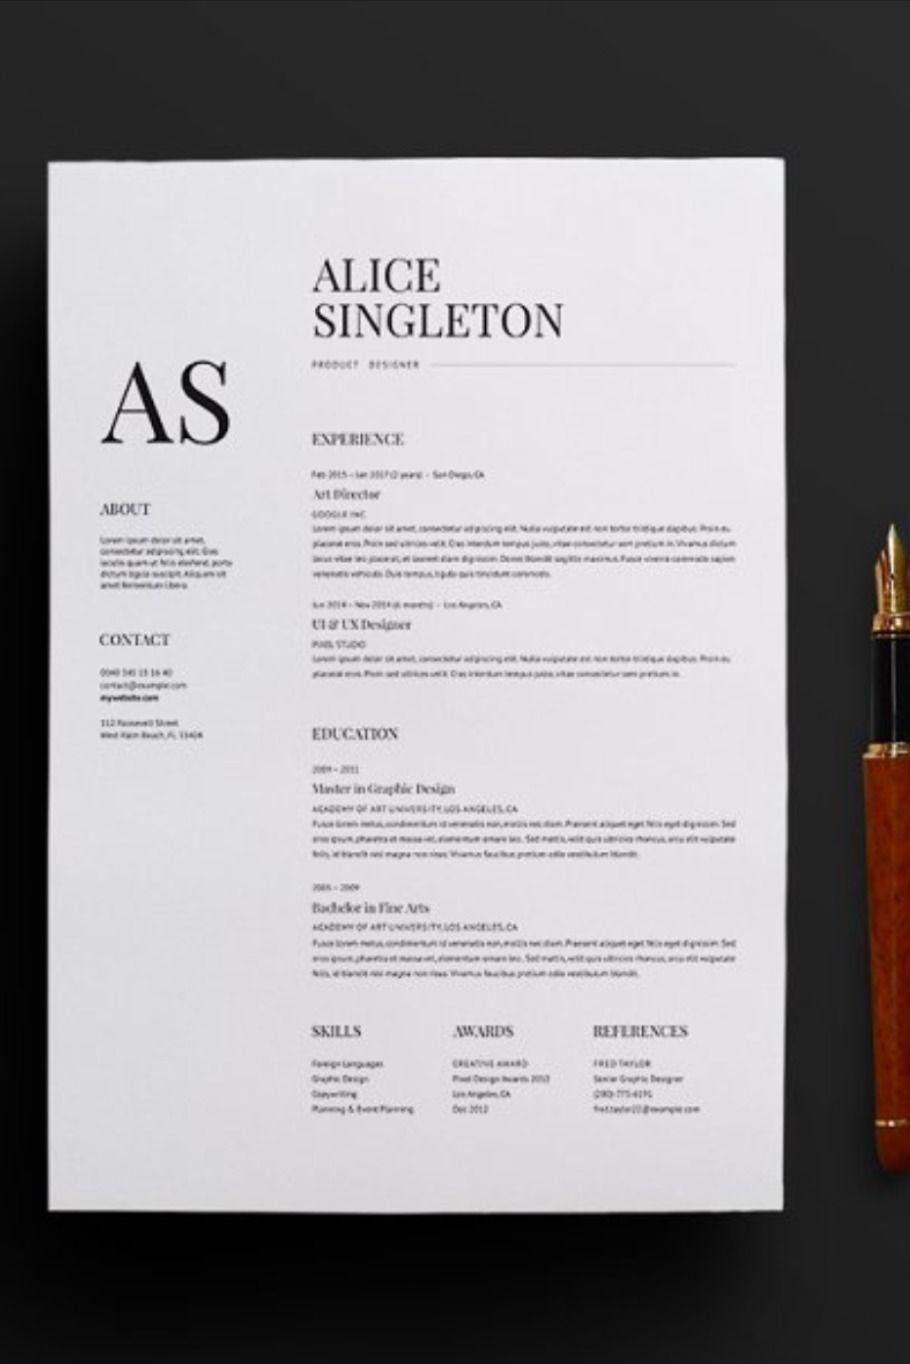 Elegant resume in 2020 with images best resume